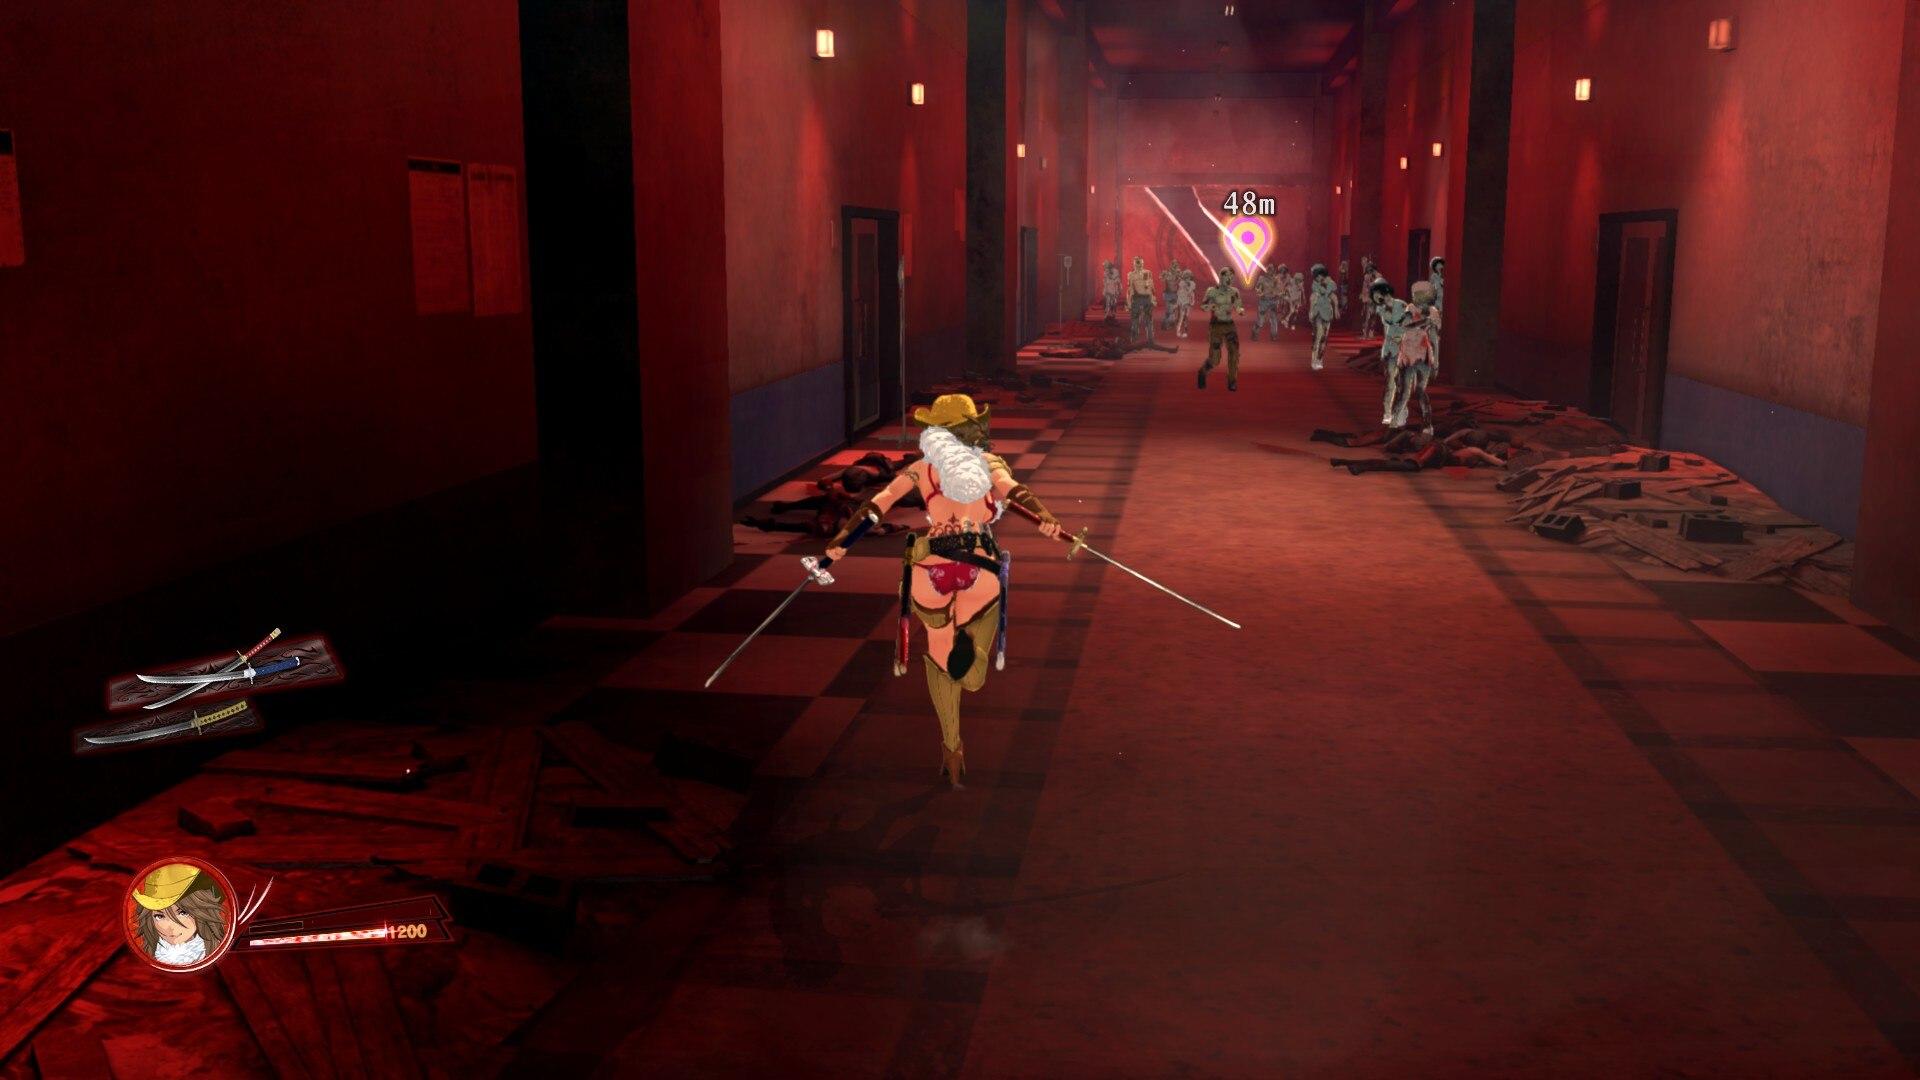 onee-chanbara-origin-pc-screenshot-1